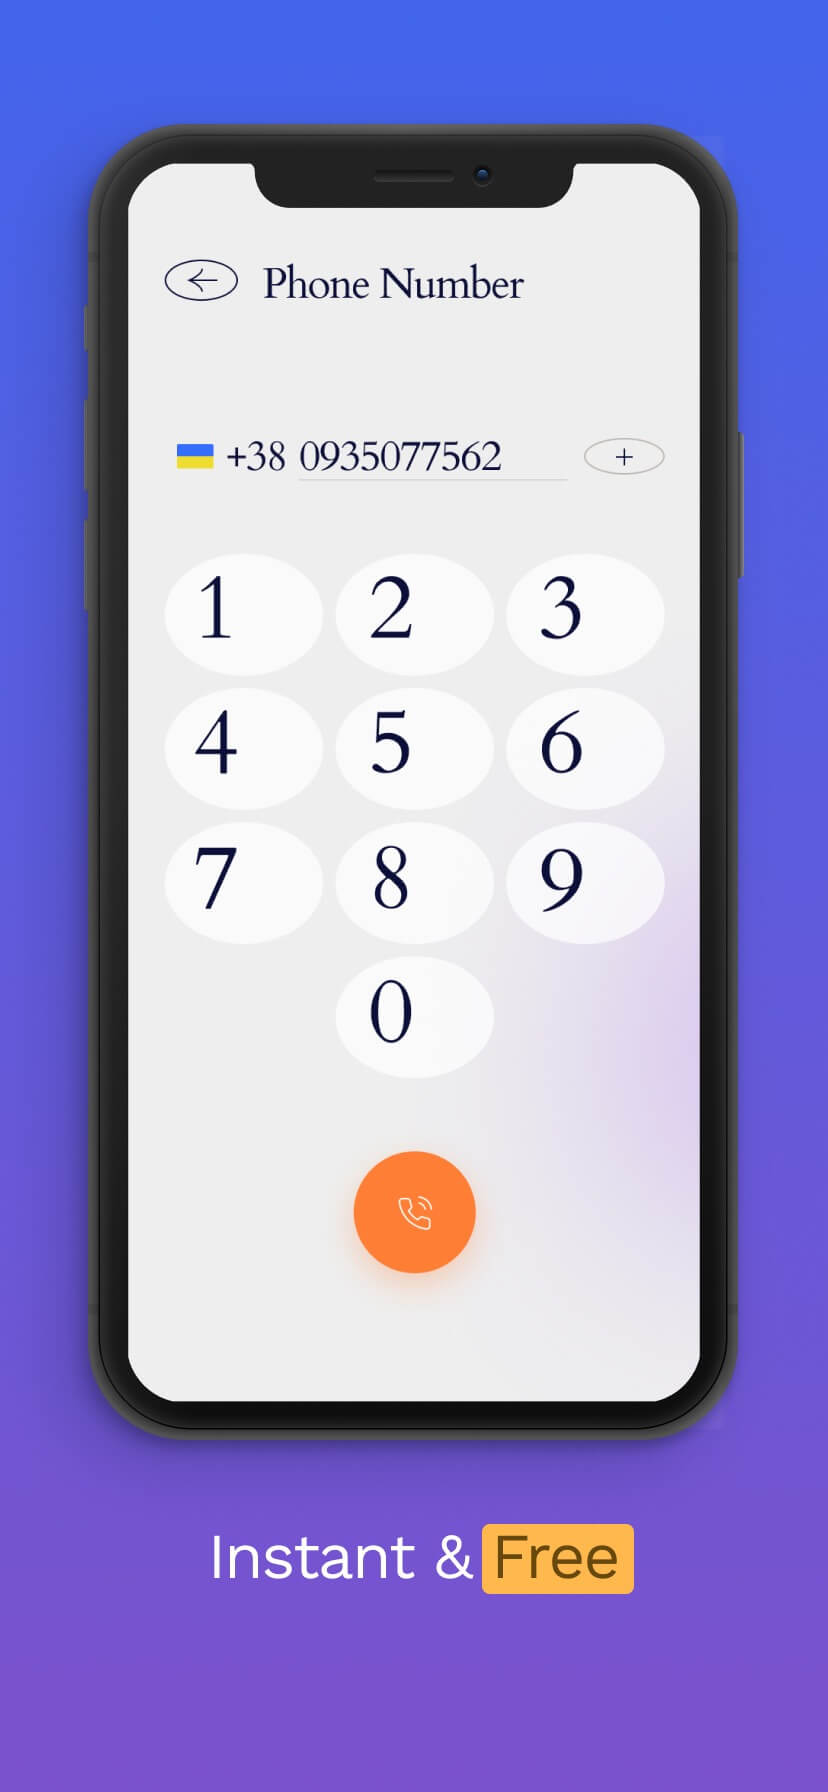 Blue and purple gradient app store screenshot #1